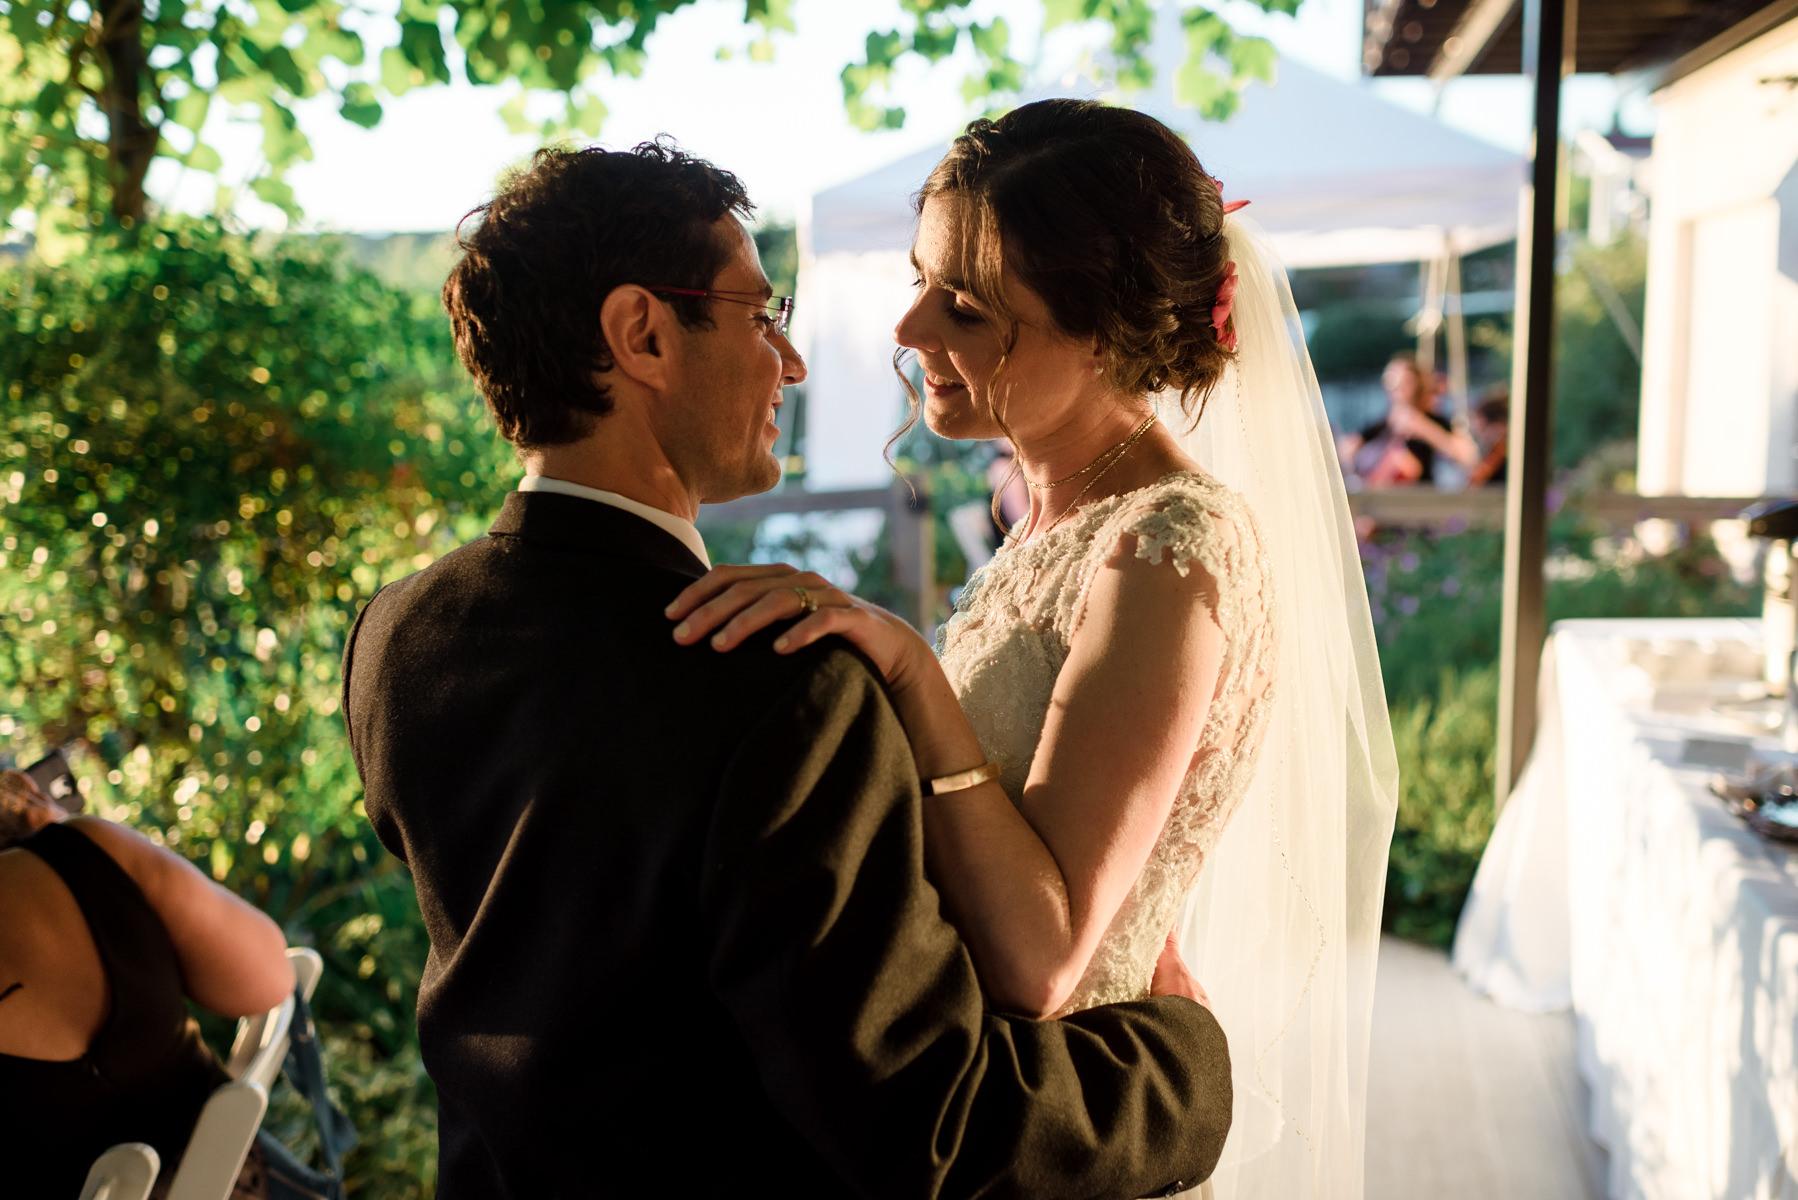 Andrew Tat - Documentary Wedding Photography - Kirkland, Washington - Emily & Cuauh - 47.JPG